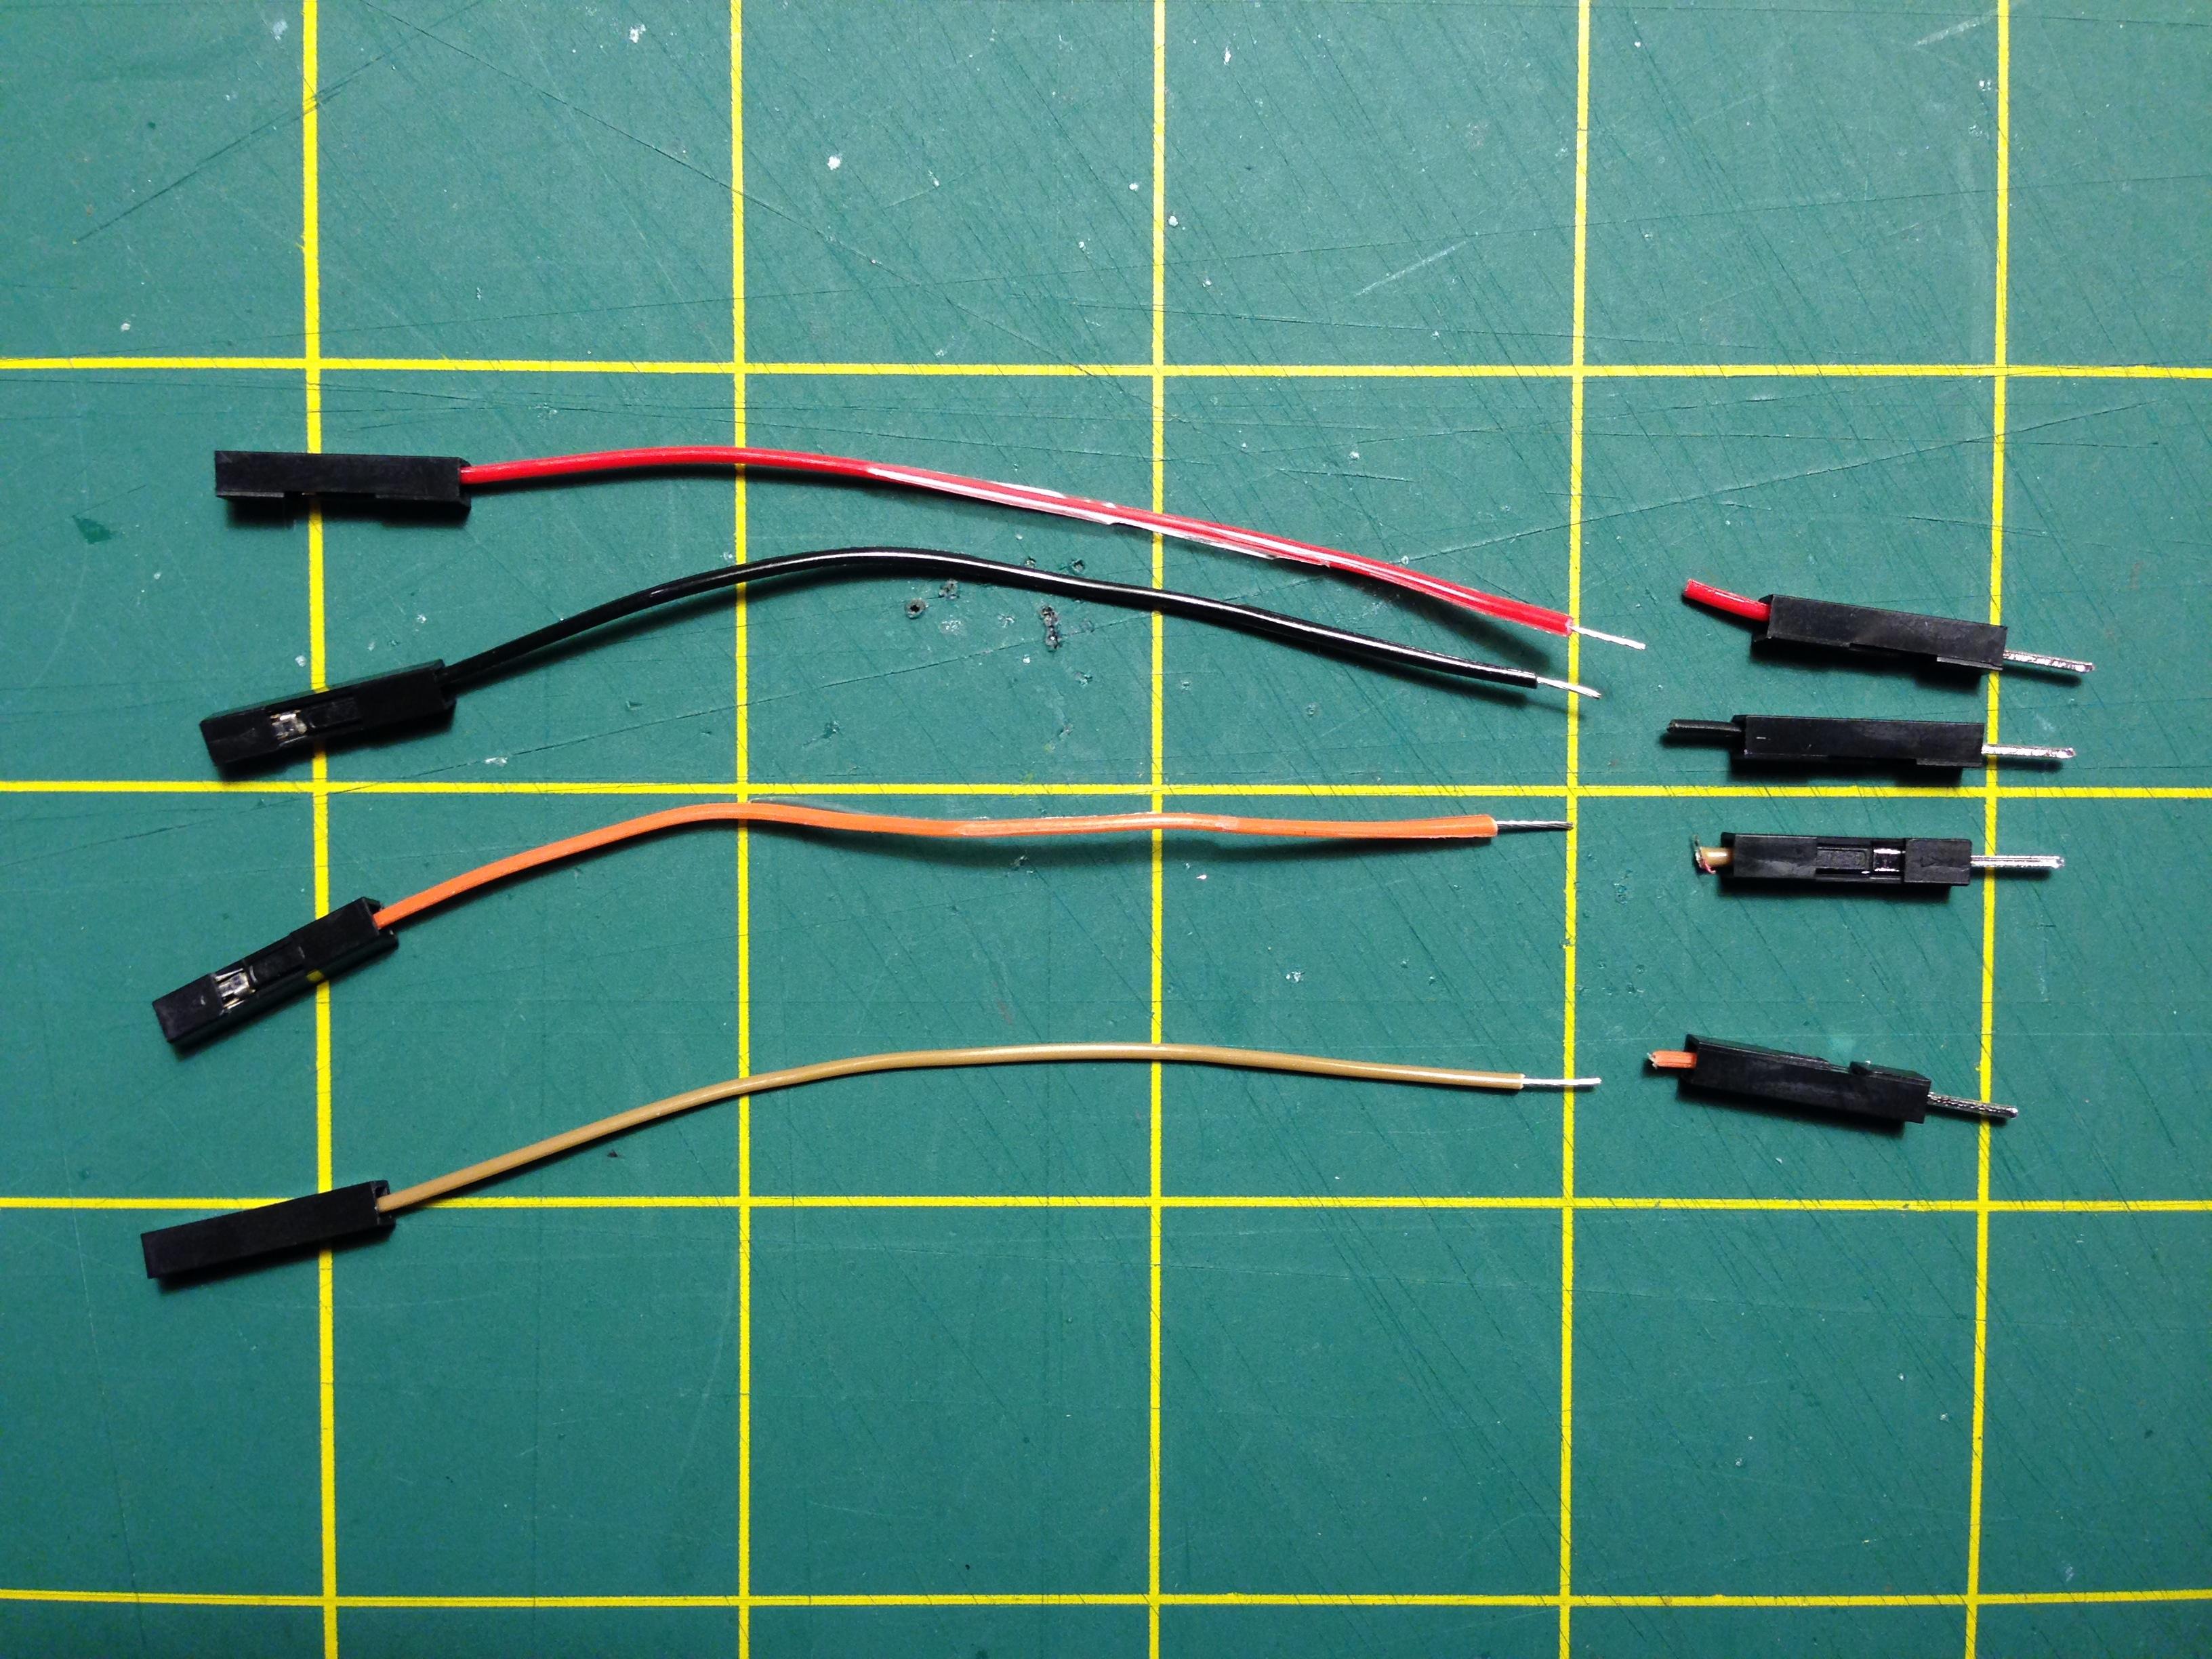 adafruit_products_vetomusic-jumper_wires.jpg